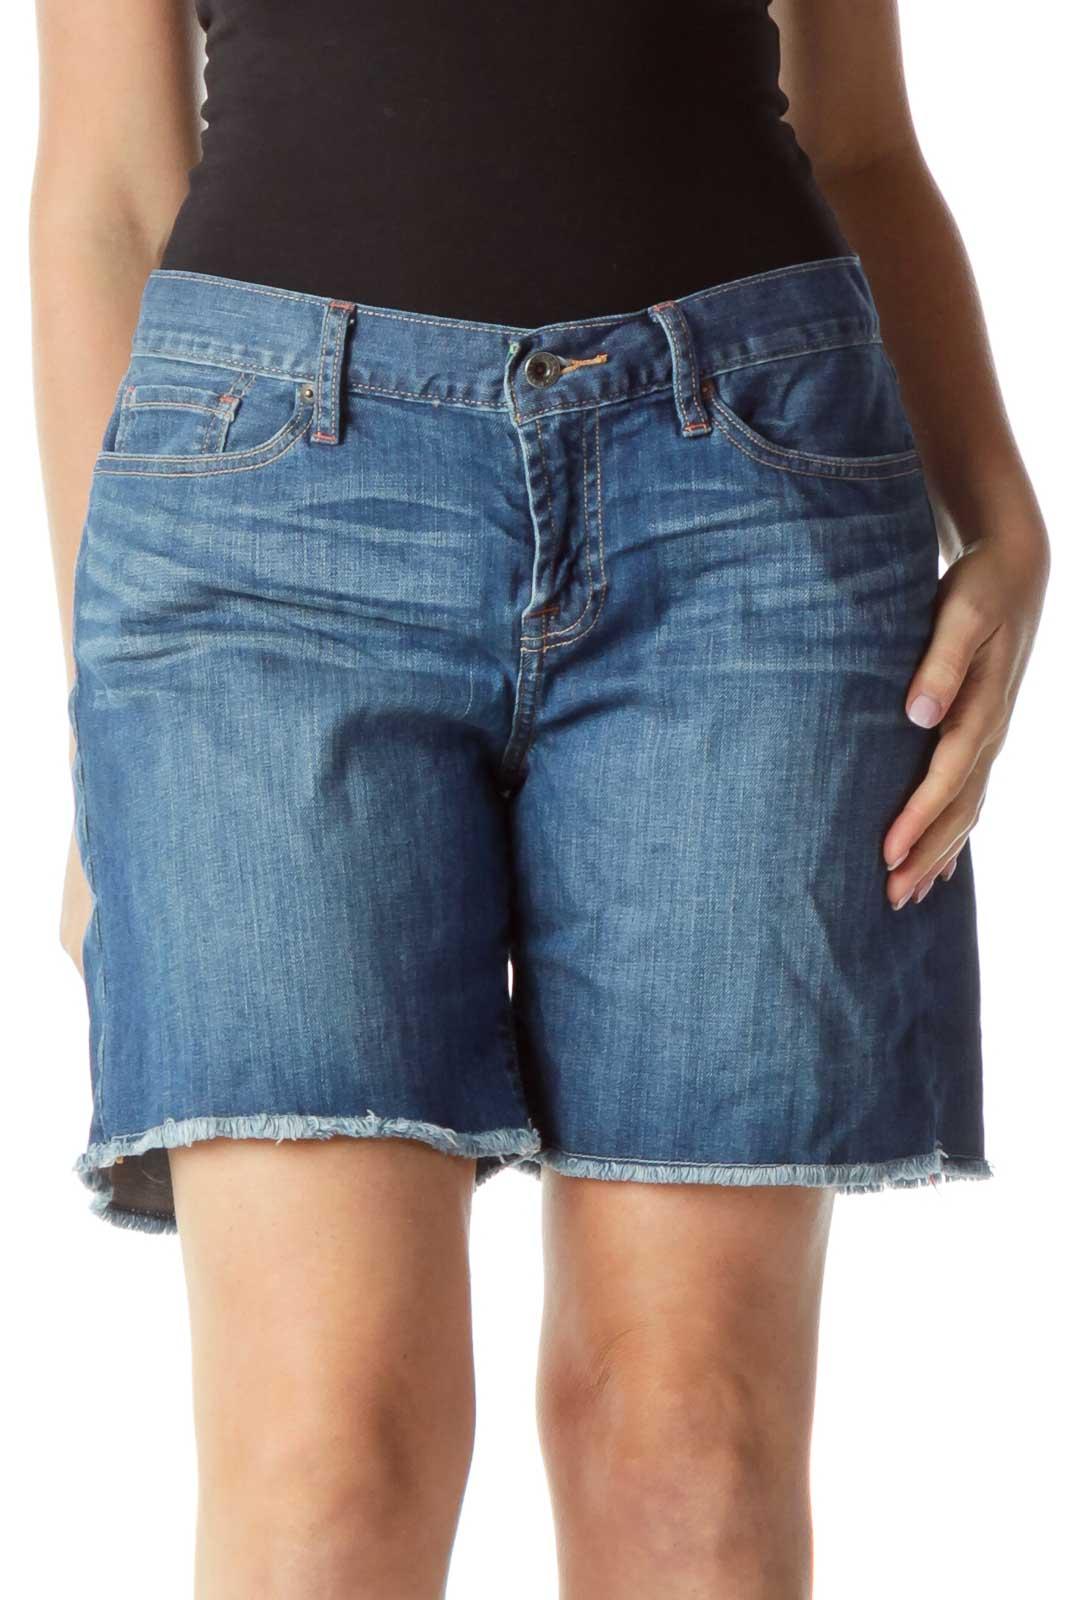 Blue Abbey Short Denim Shorts Front